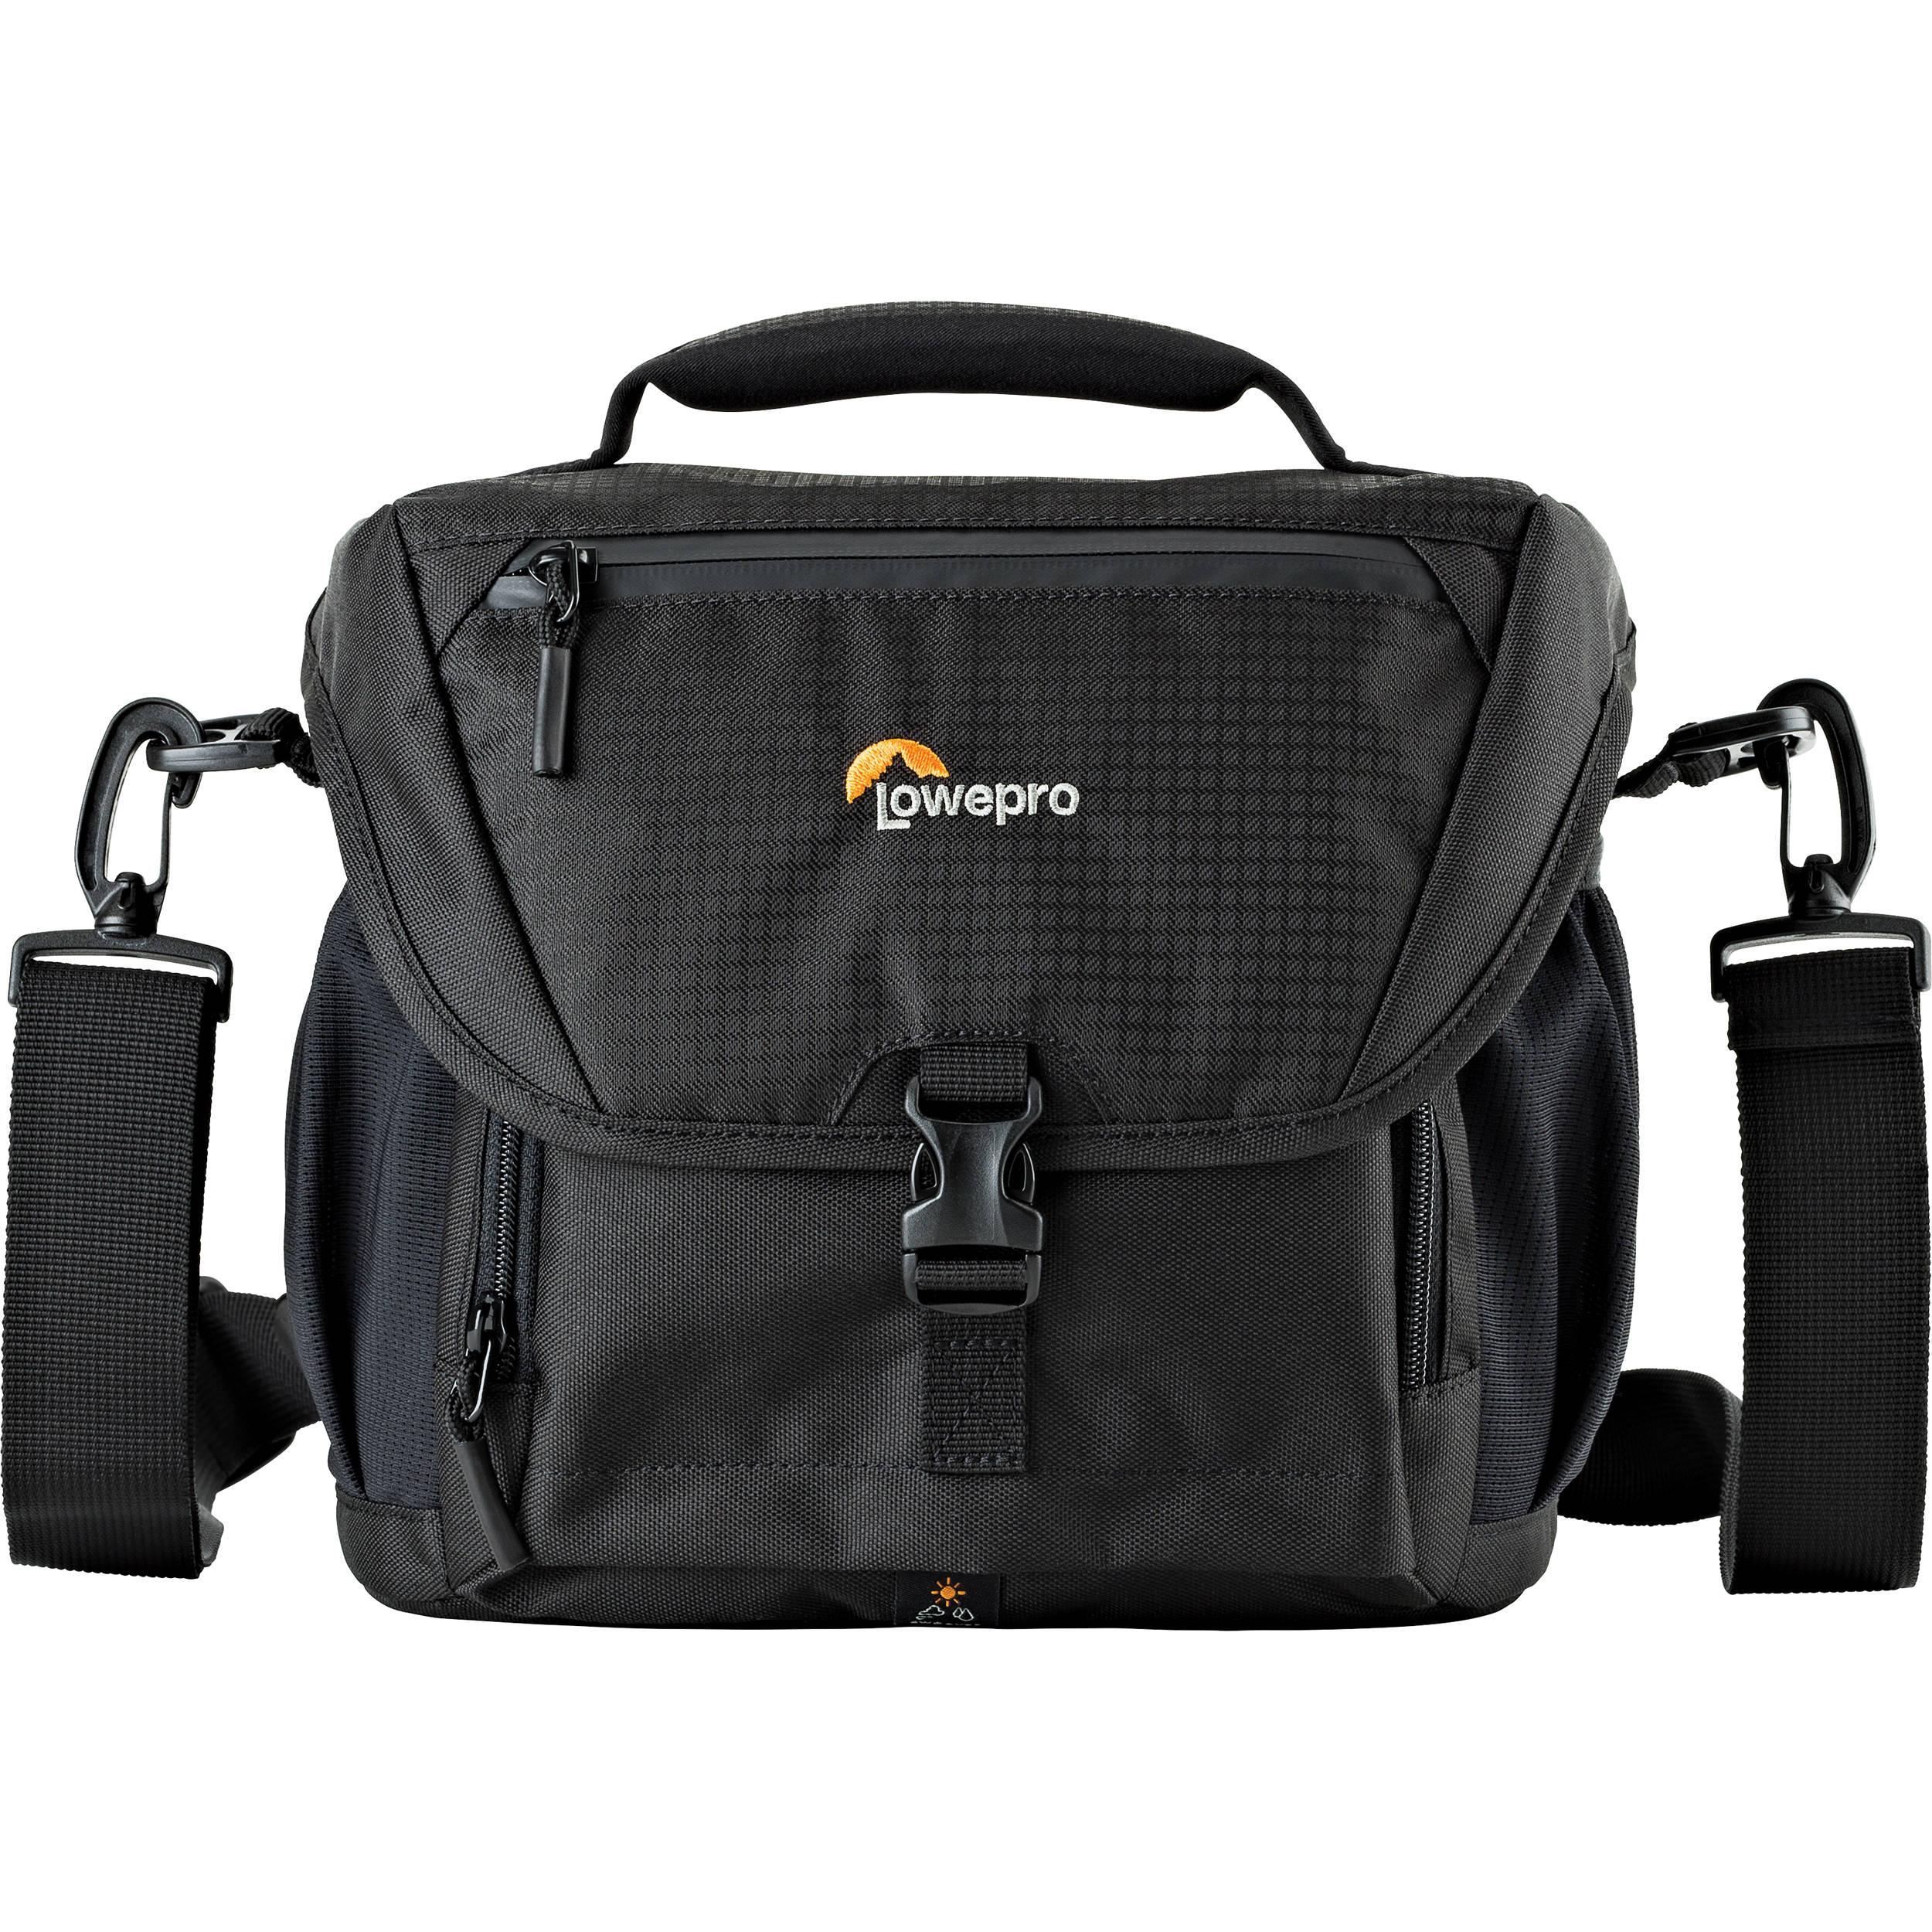 Lowepro Nova 170 Aw Ii Camera Bag Black